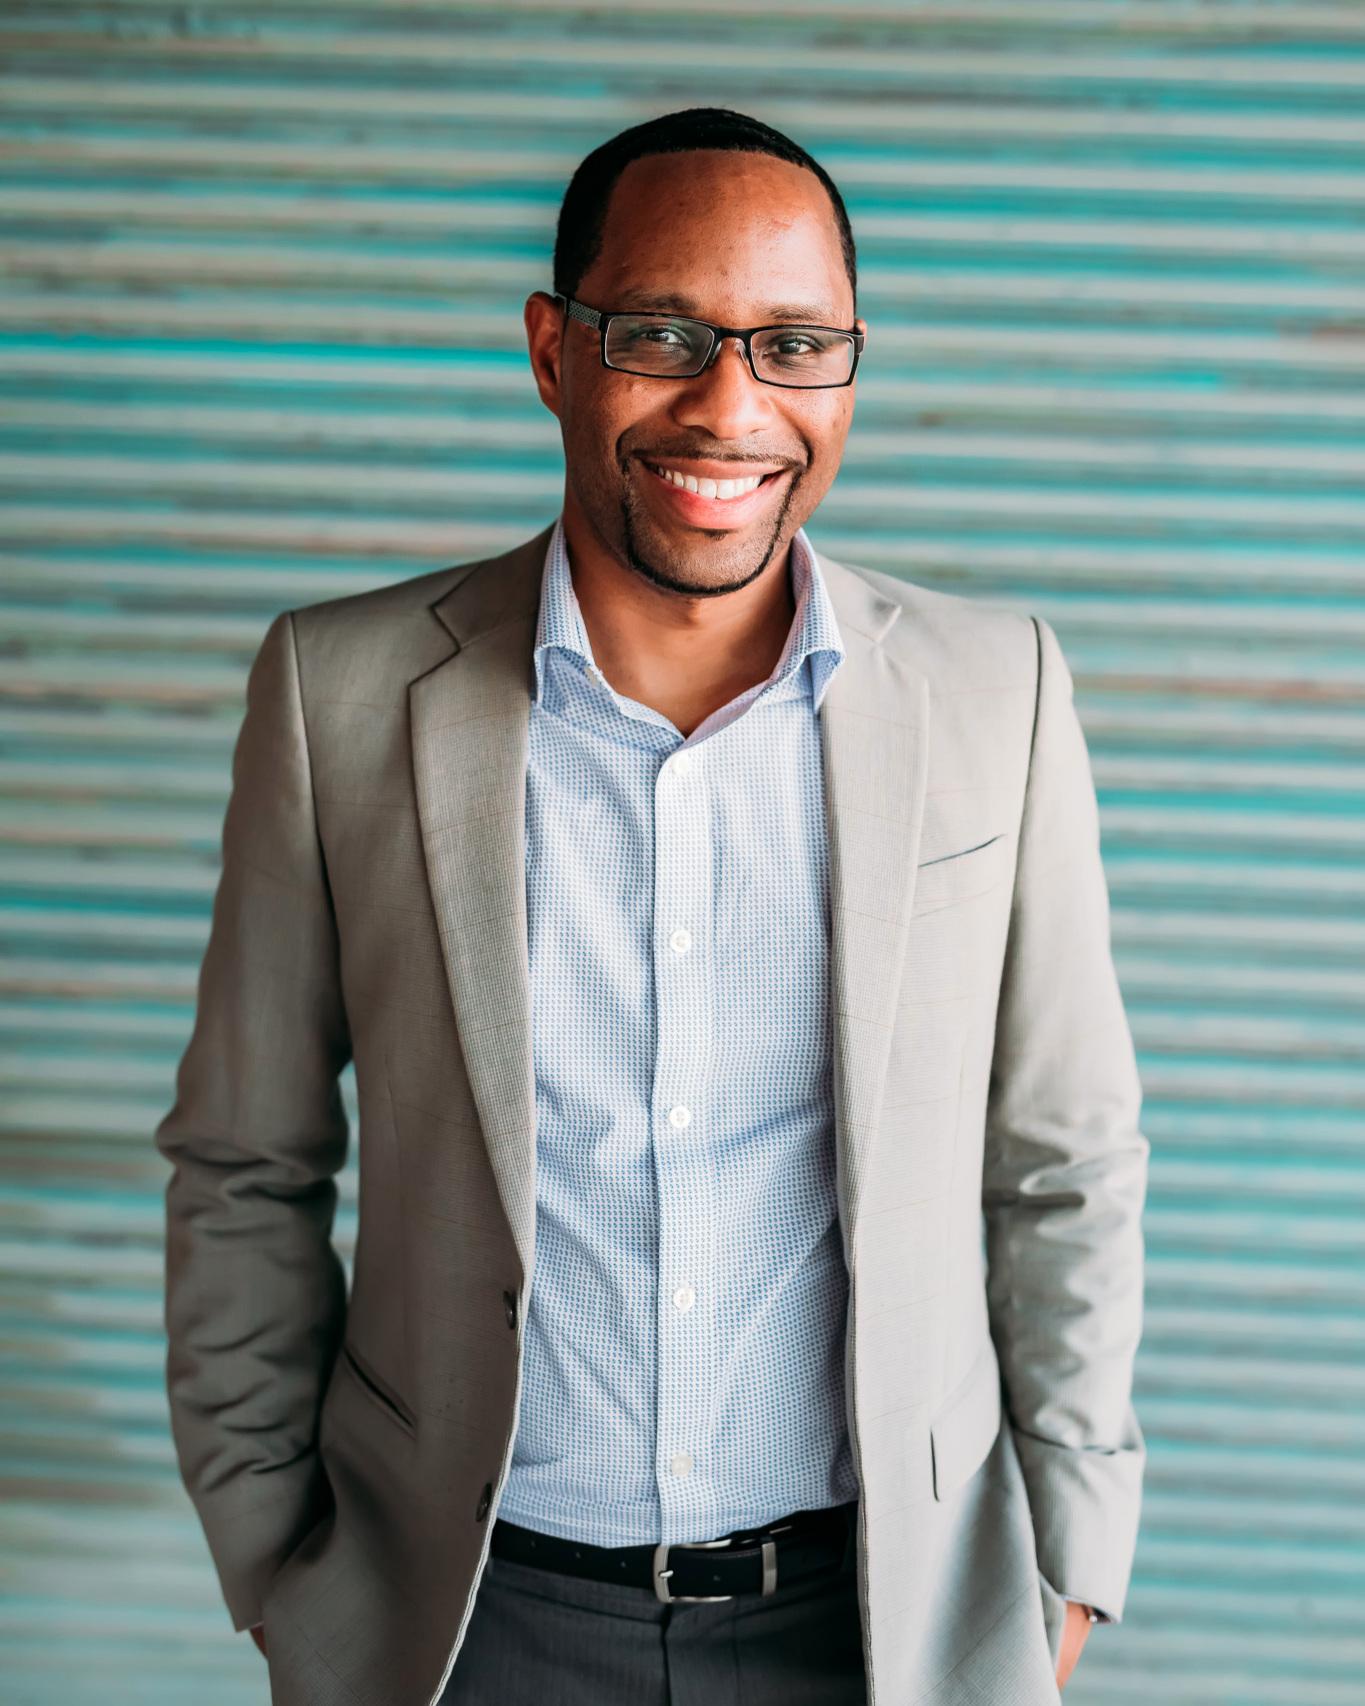 Reuben Cummings - Nerevu Founder & President